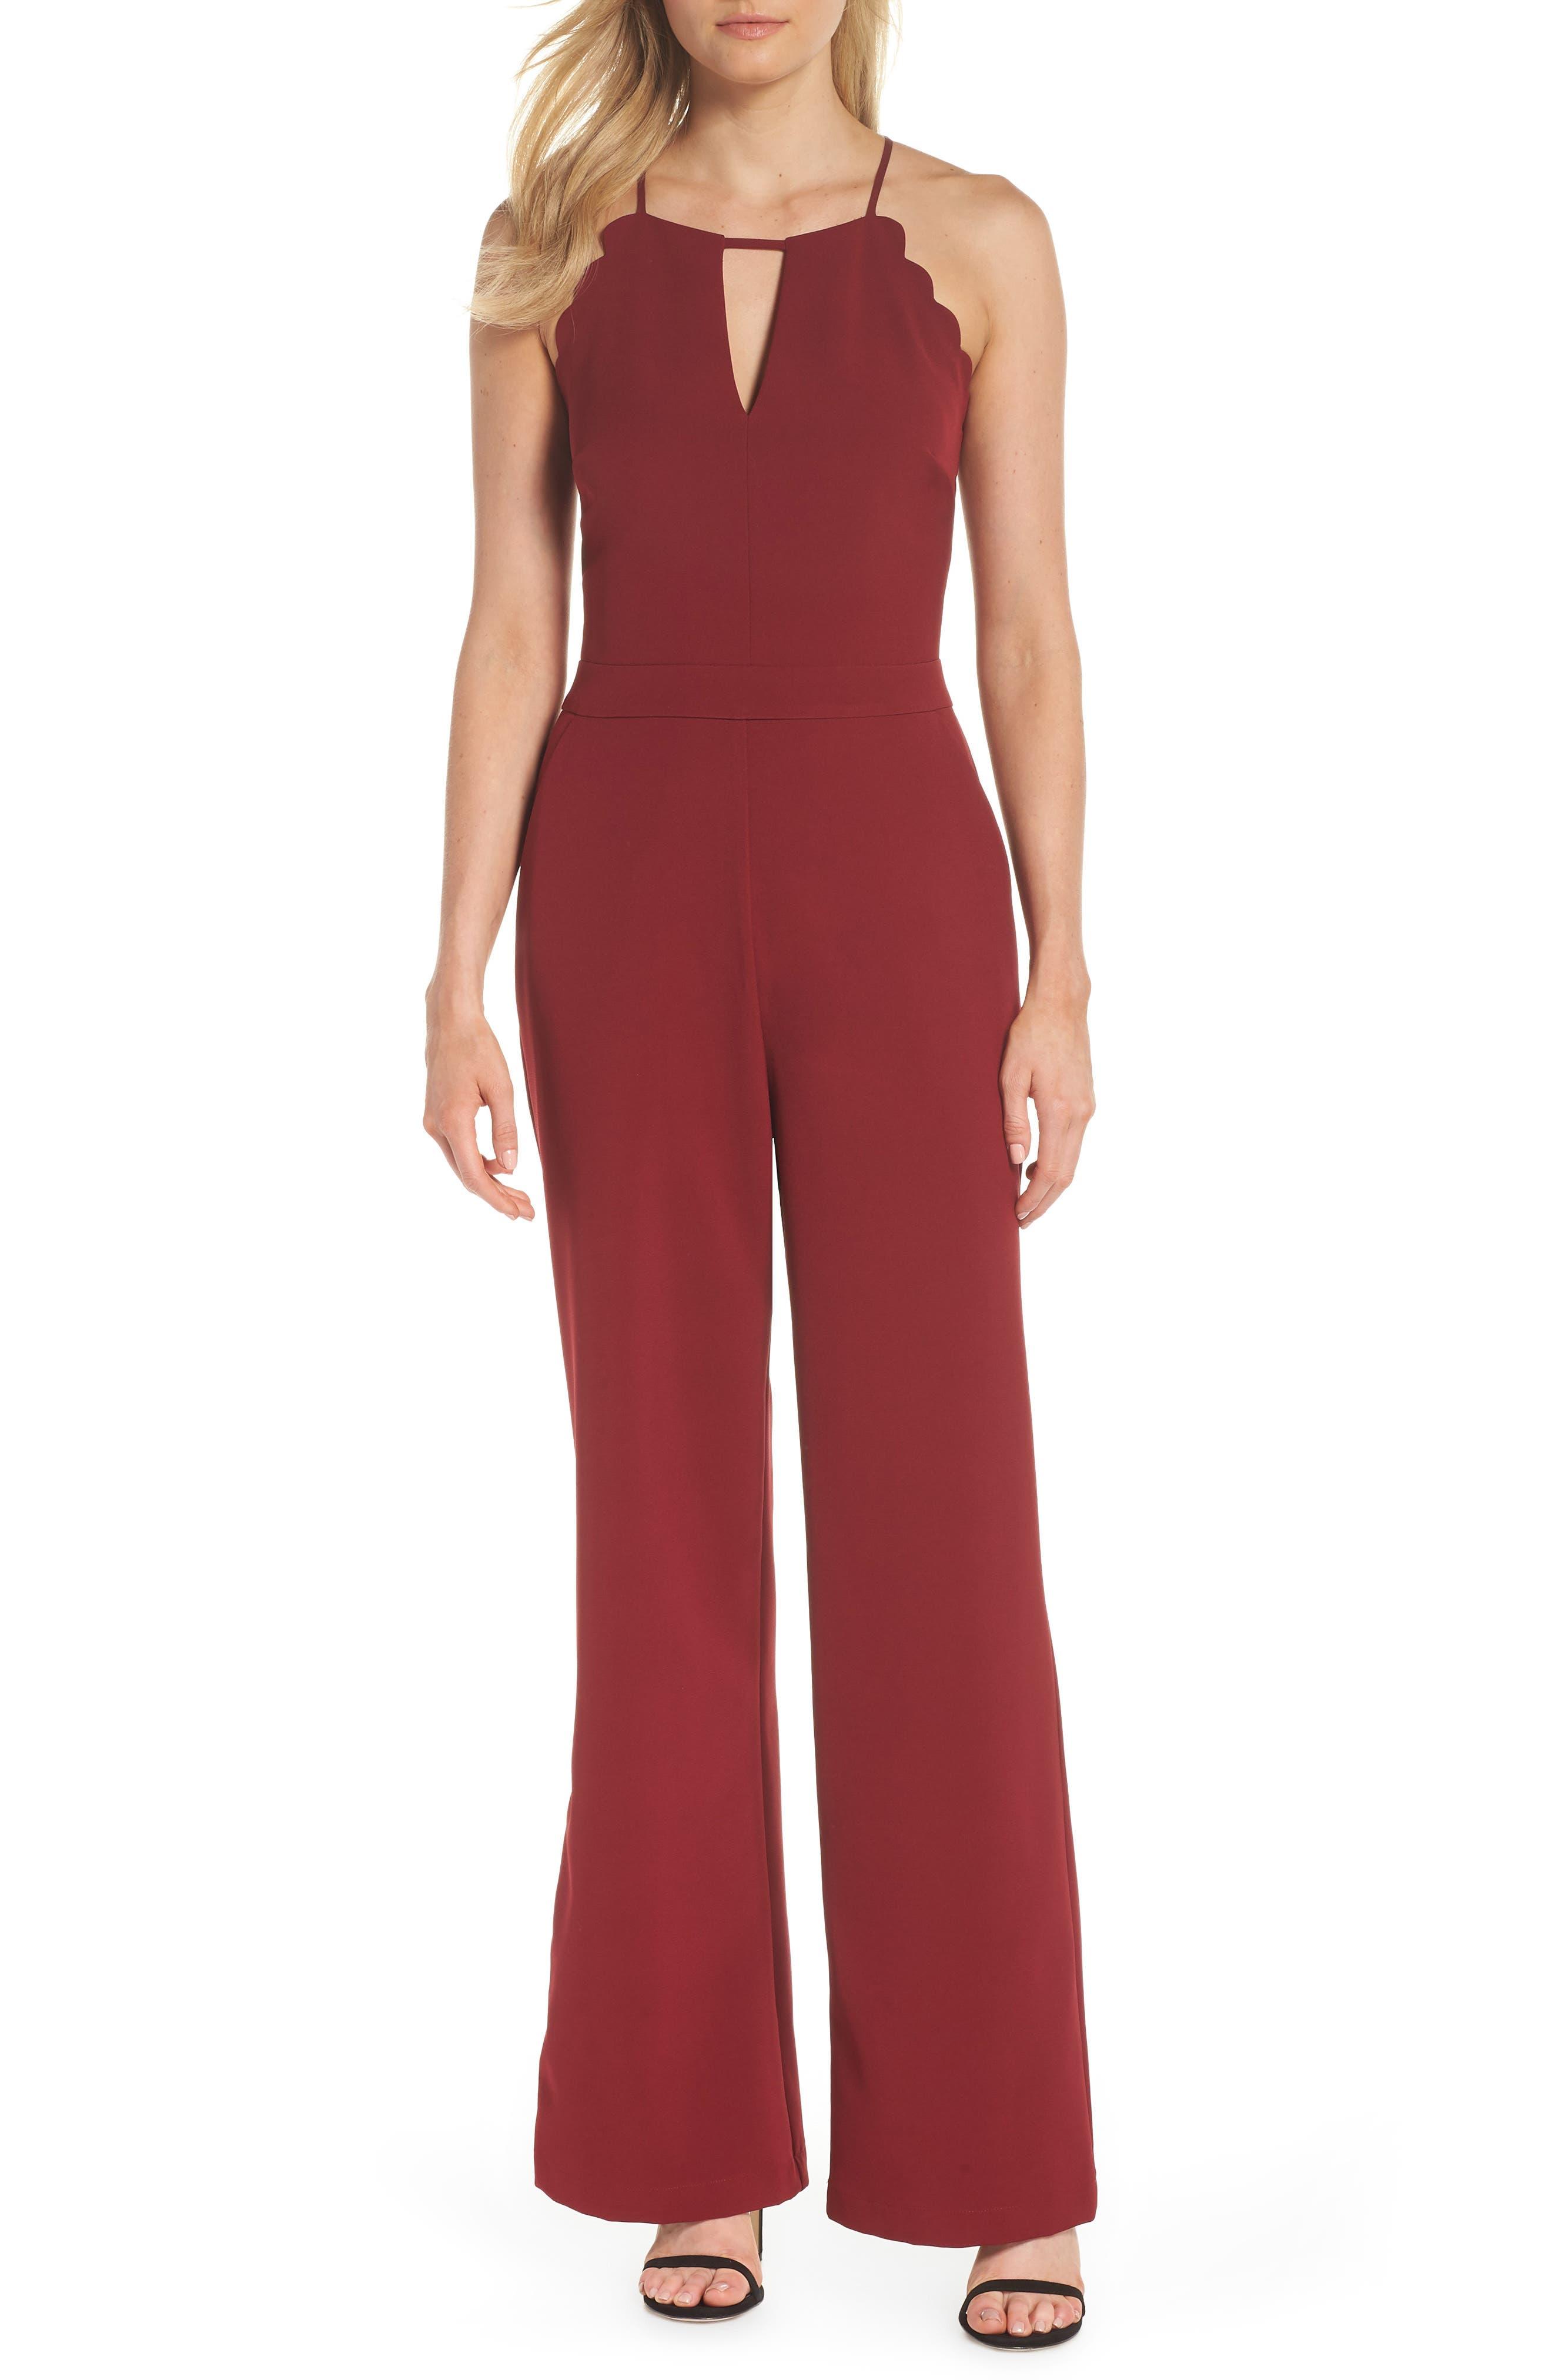 Denise Halter Jumpsuit,                         Main,                         color, BULL RED